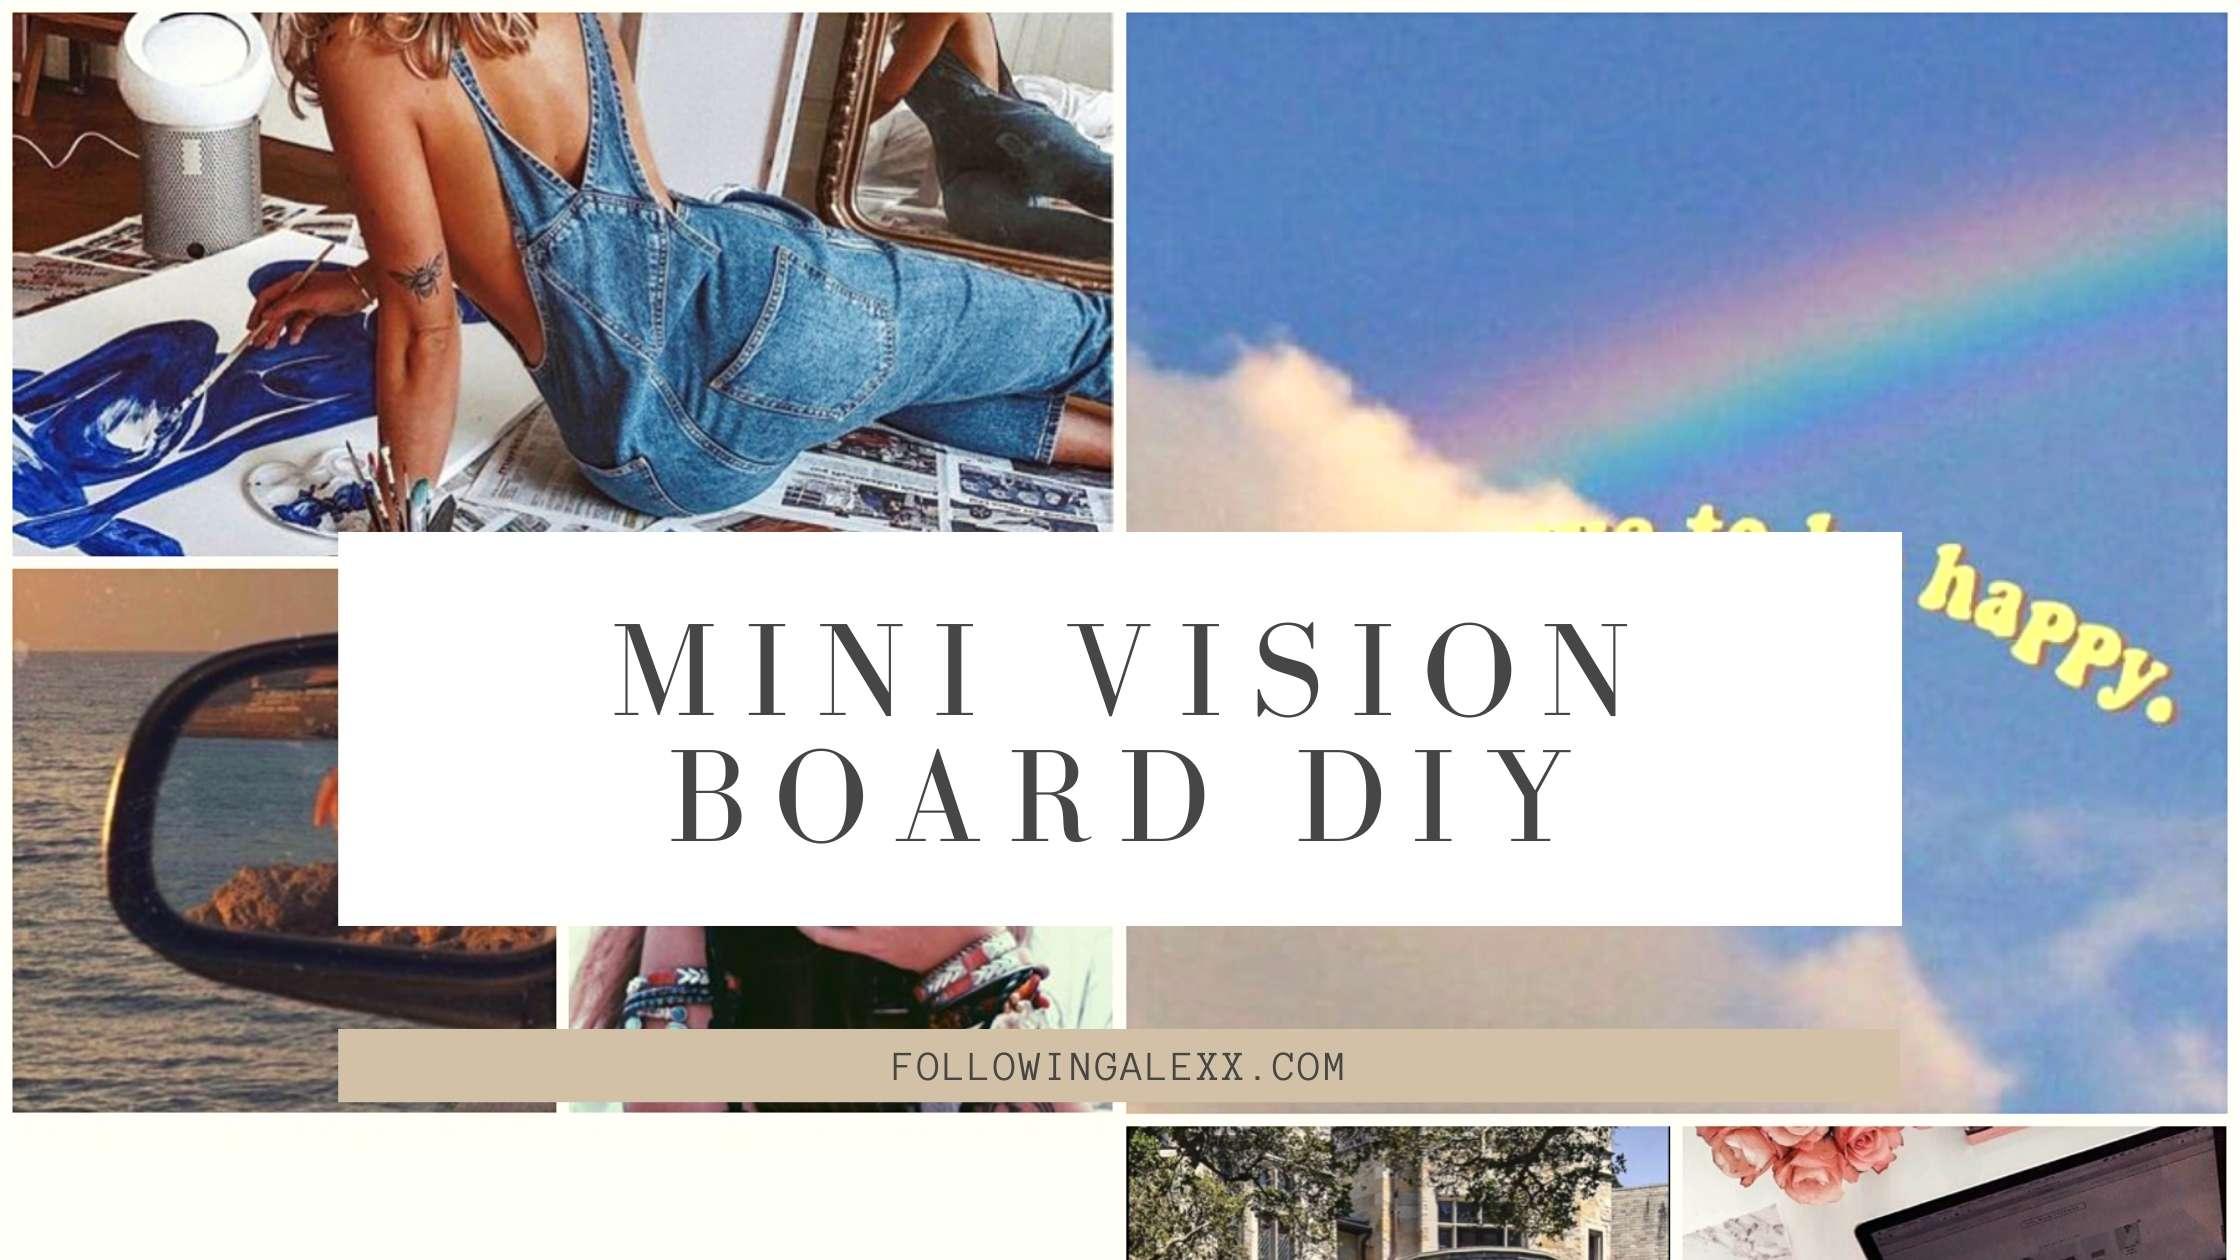 MINI VISION BOARD DIY